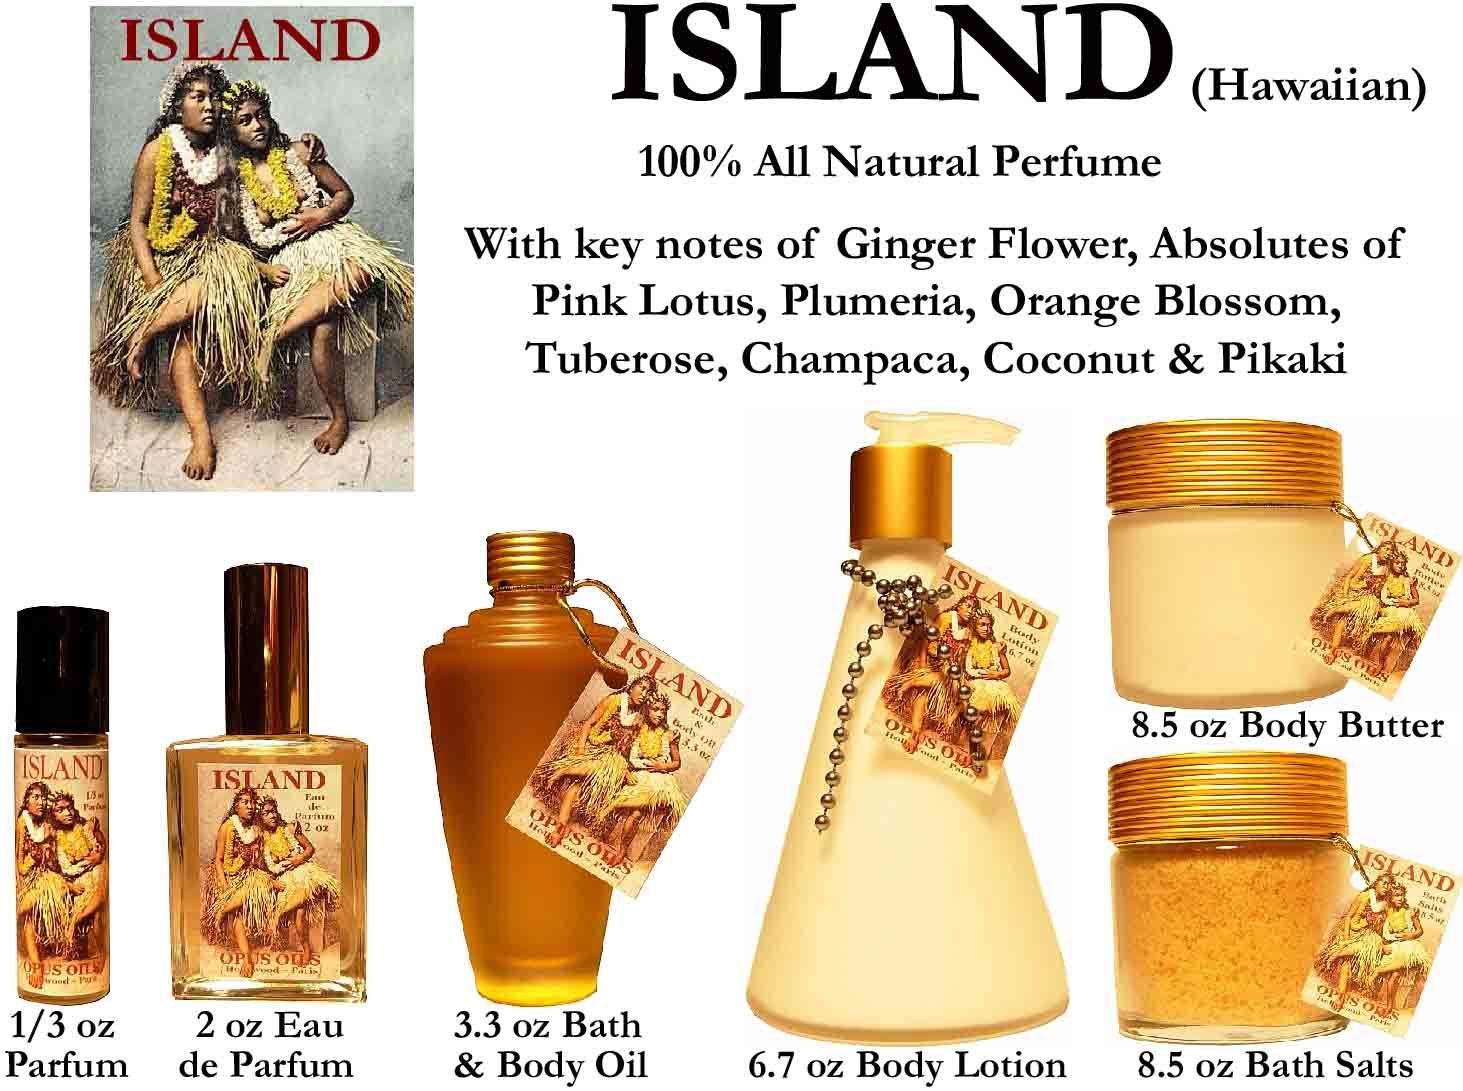 Opus Oils Island I Love This Scent Crueltyfree Www Opusoils Com Perfume Natural Perfume Island Girl